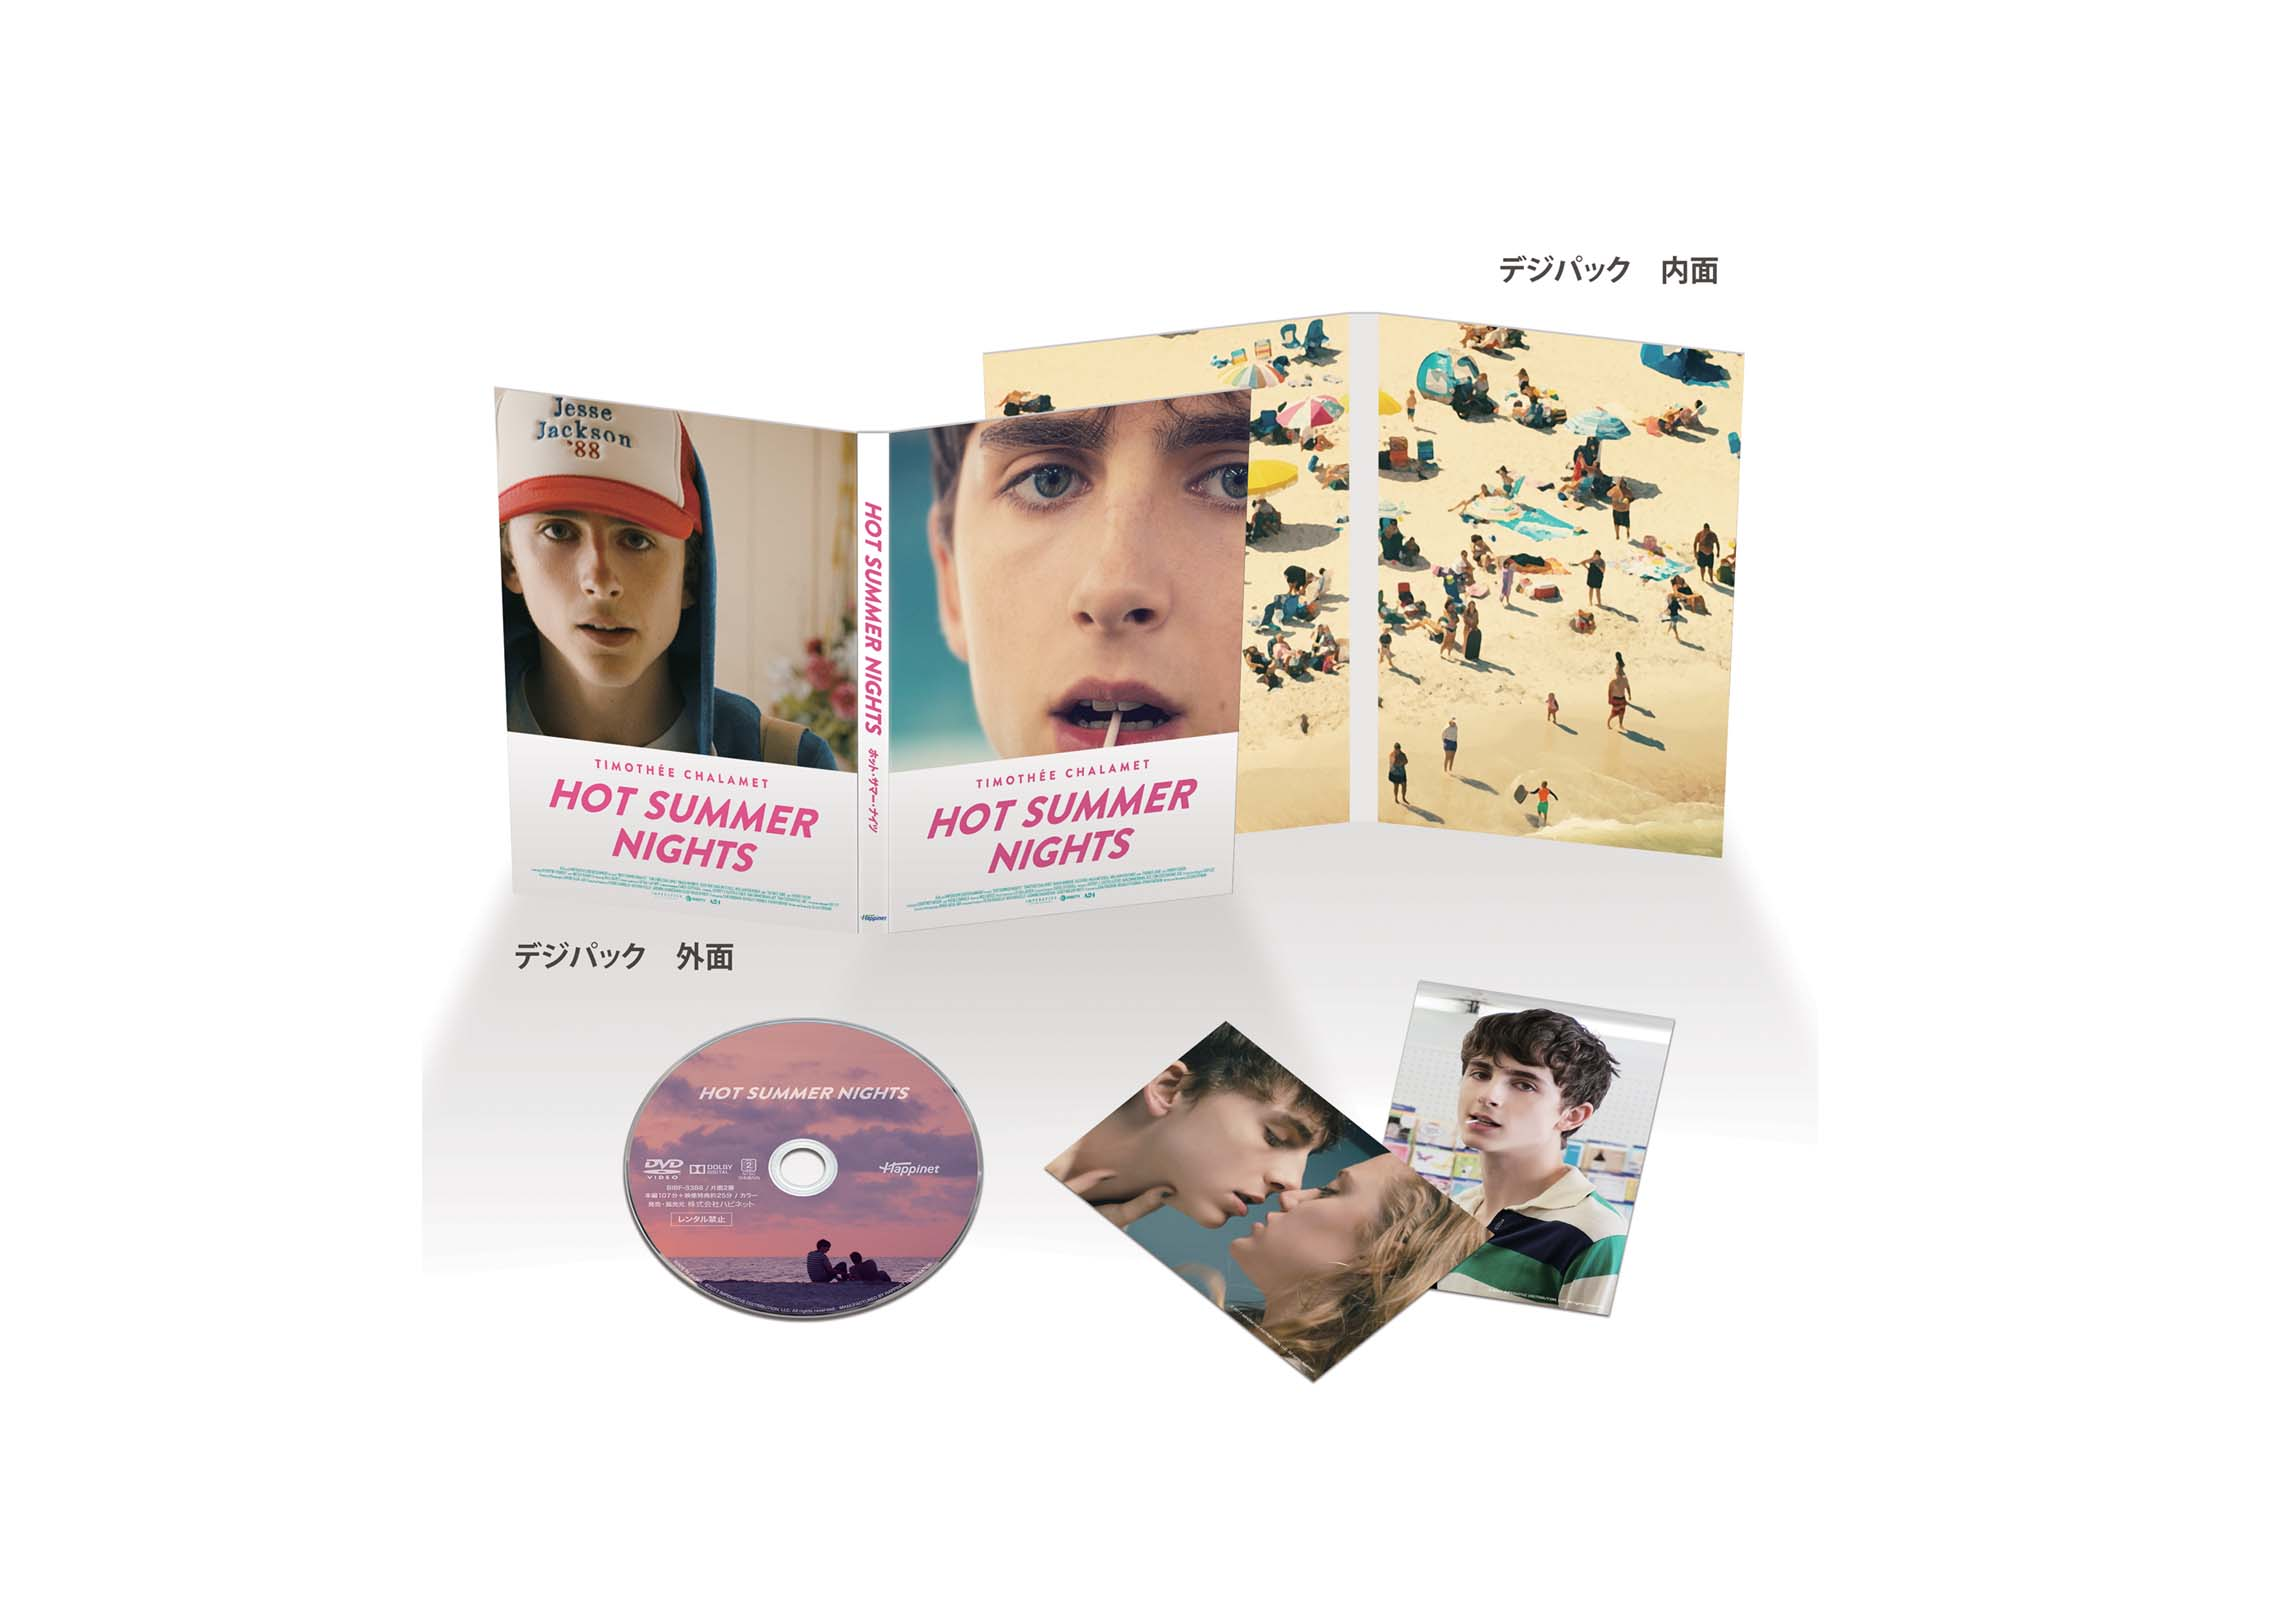 【HOT SUMMER NIGHTS/ホット・サマー・ナイツ】Blu-ray&DVD 2020年1月8日発売!